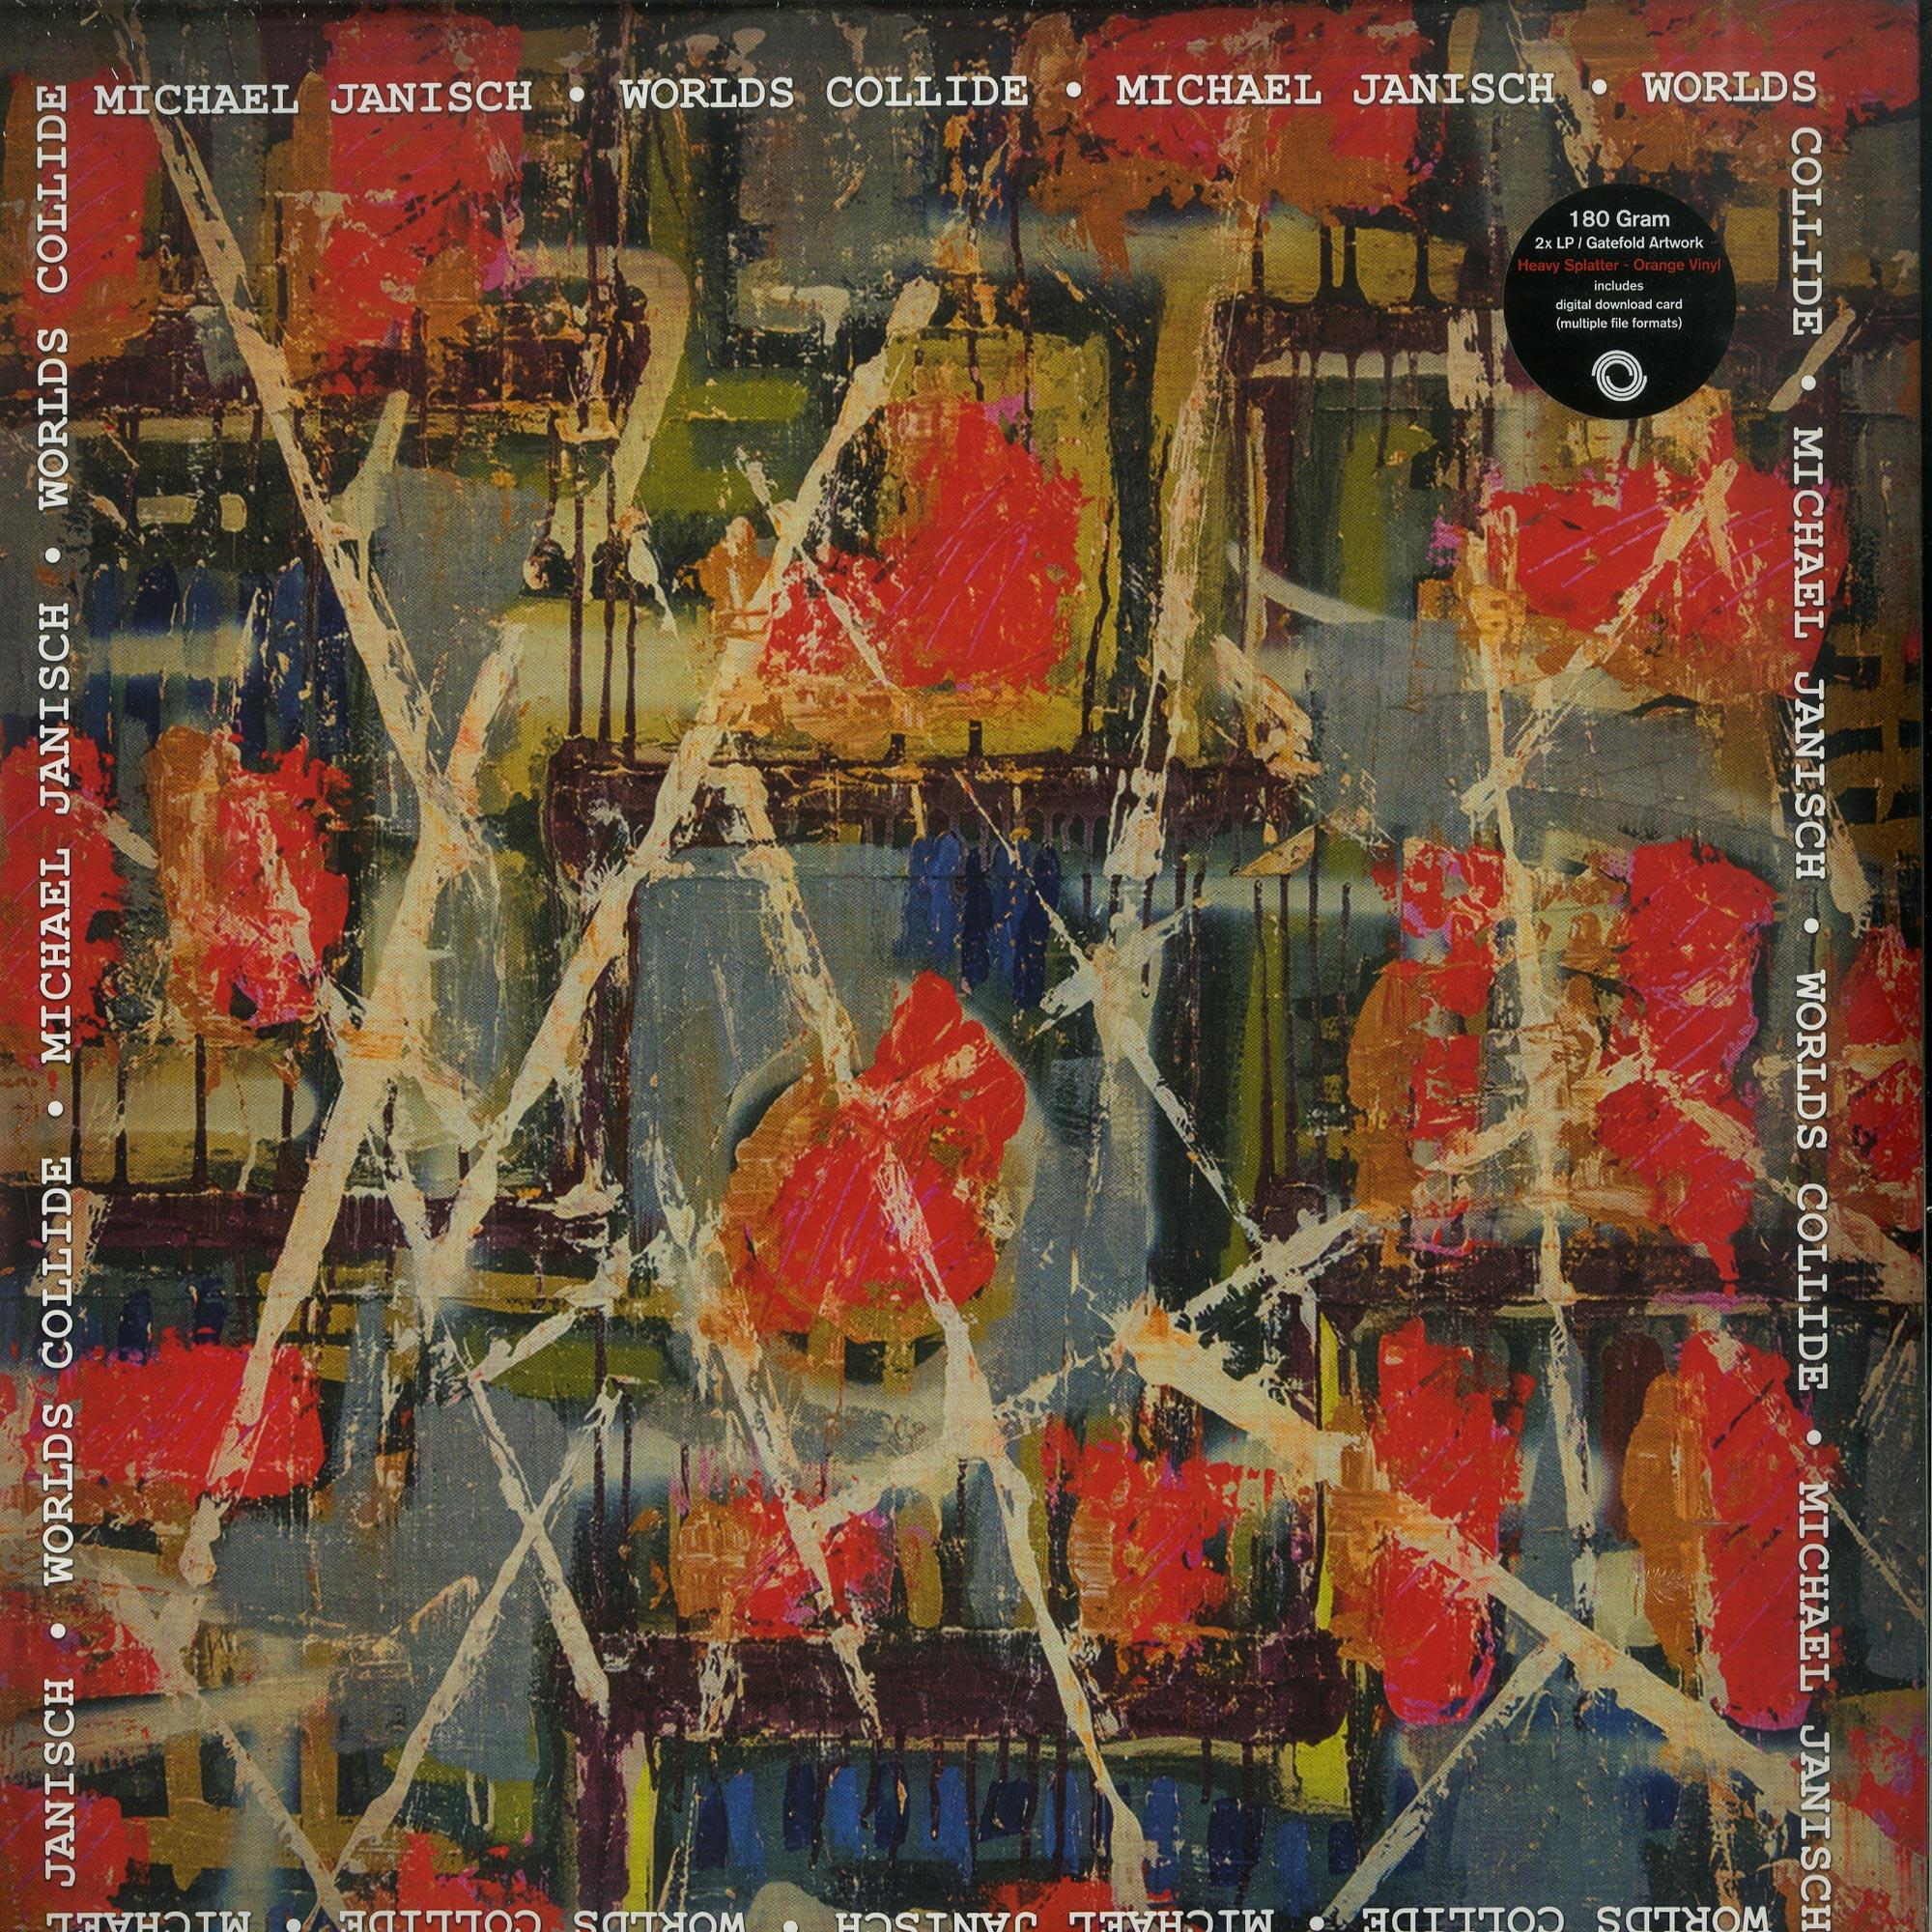 Michael Janisch - WORLDS COLLIDE